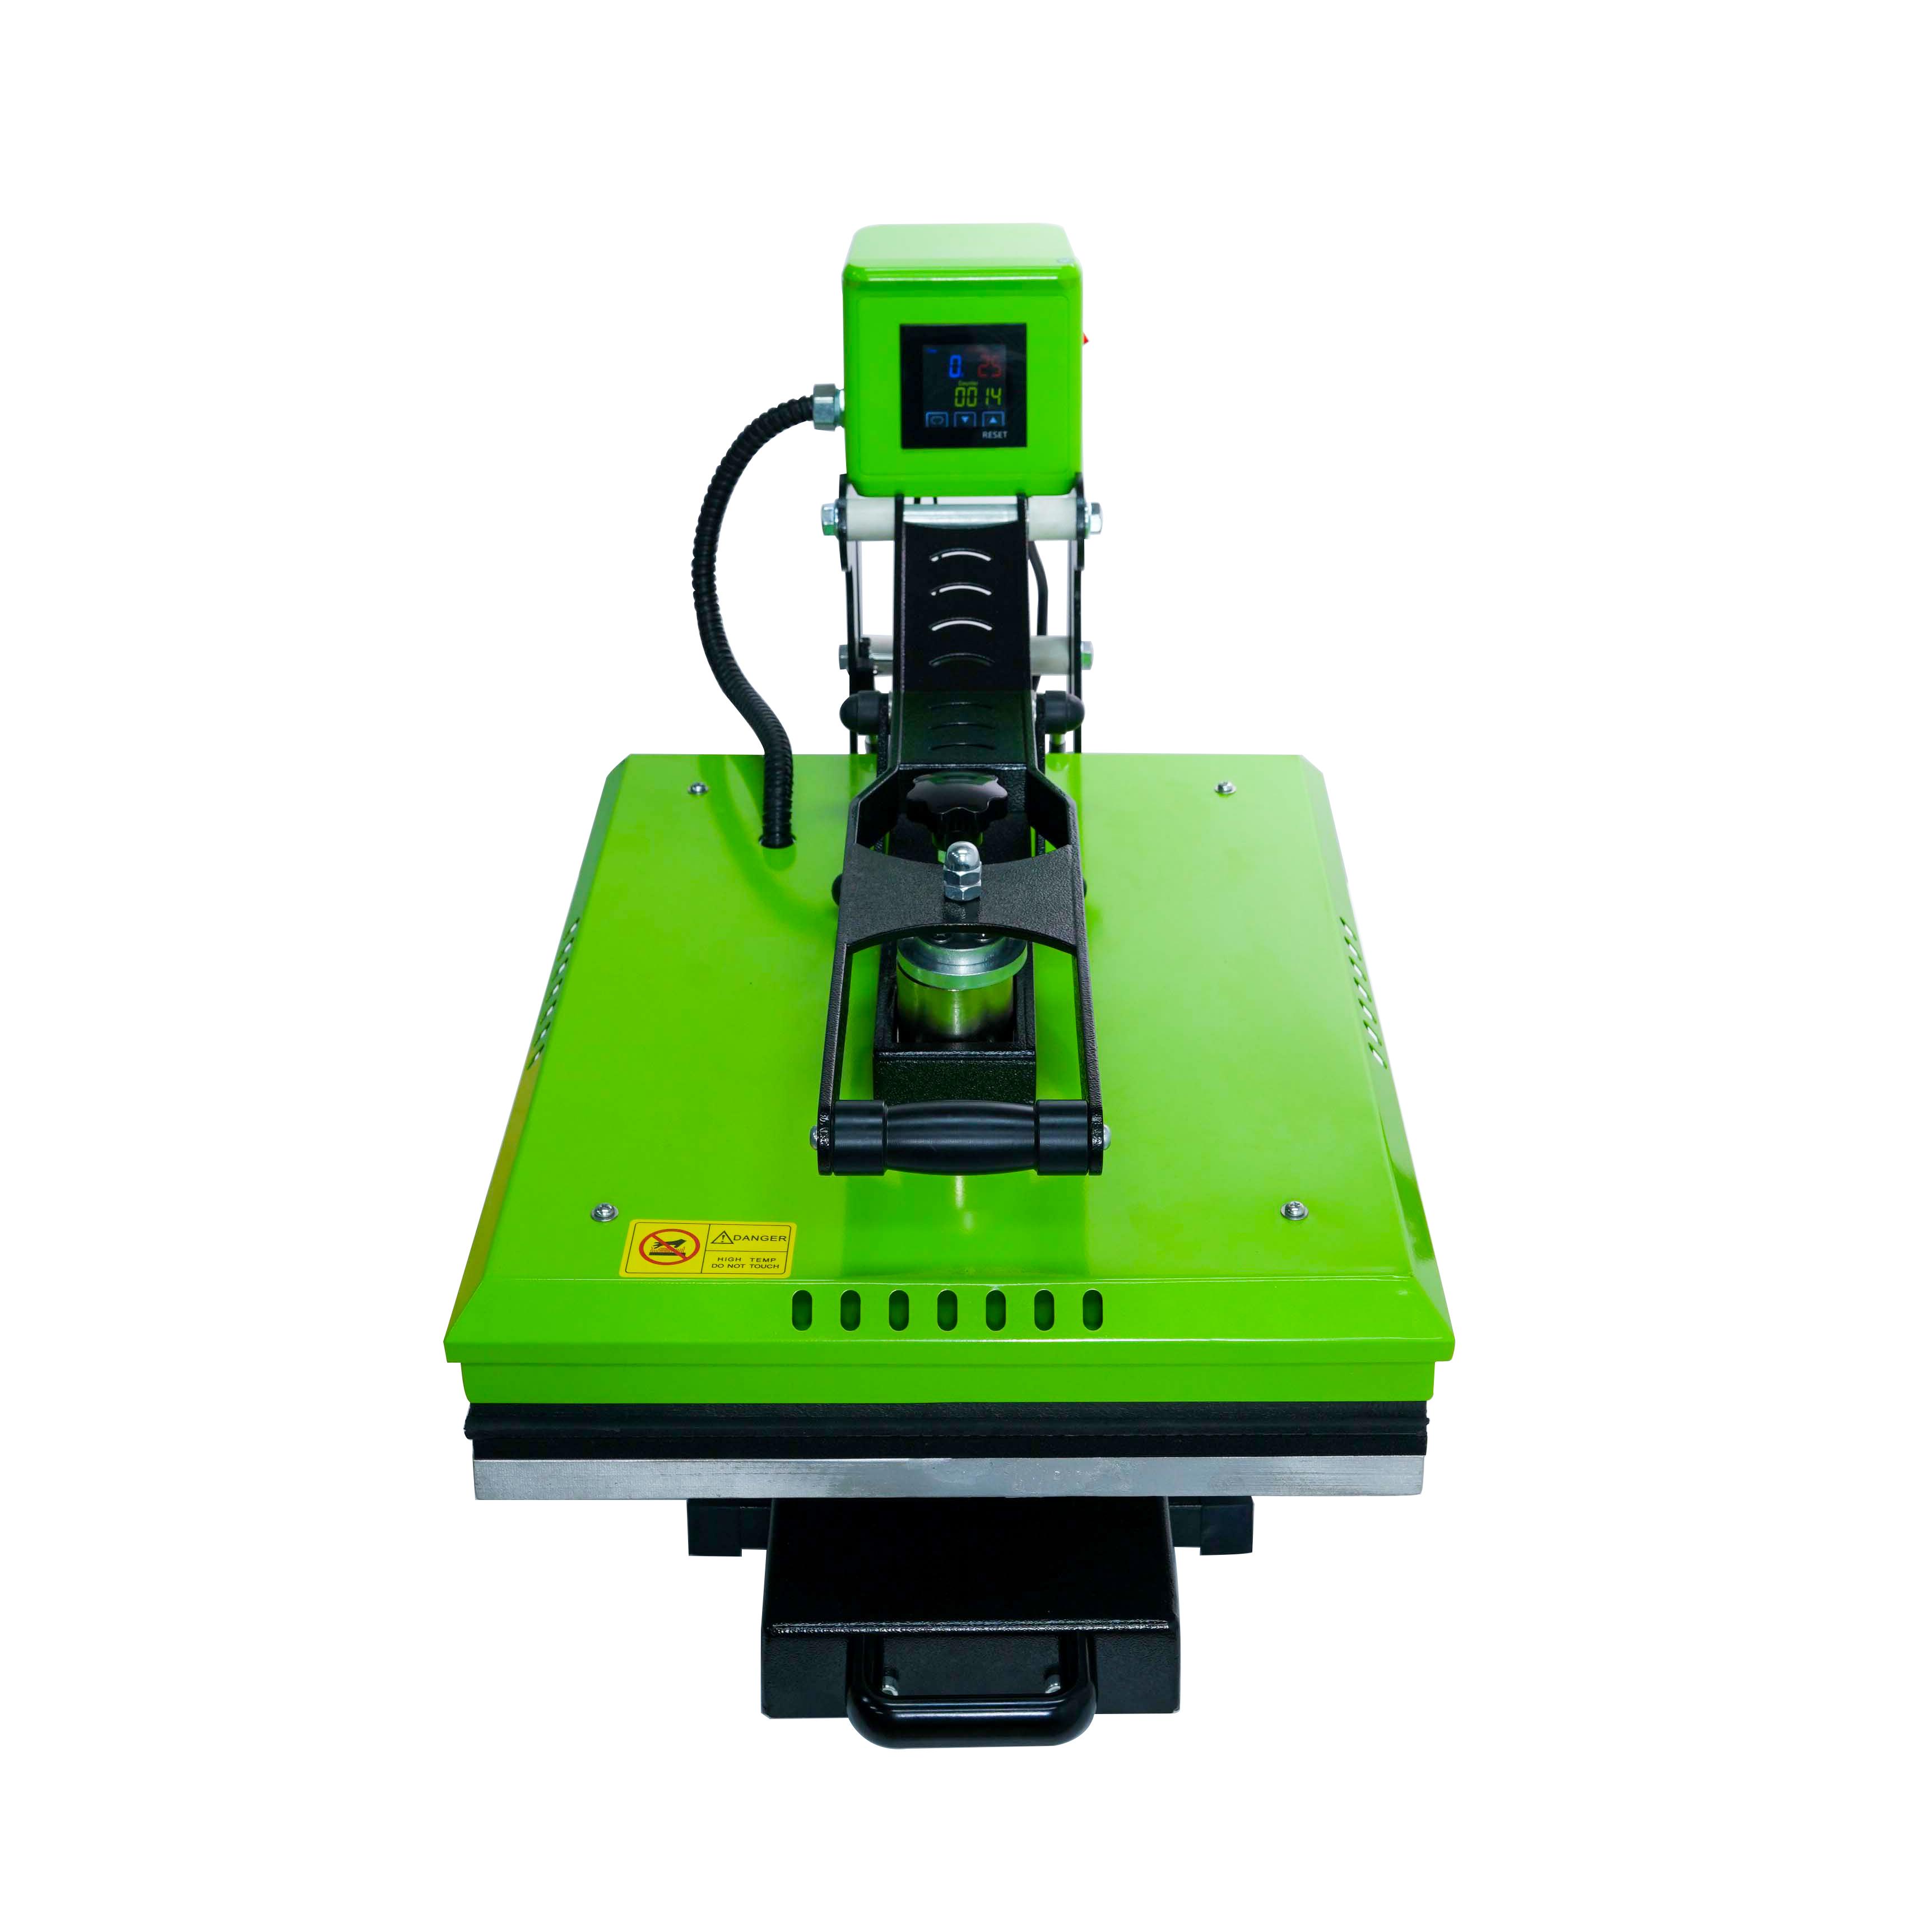 2012 Auplex Magnetic Automatic Ce Tested Heat Press Machine For T Shirt Printing Buy Heat Press Machine For Sale In Uk Logo Printing Machine Lcd Controller Heat Press Machine Product On Alibaba Com